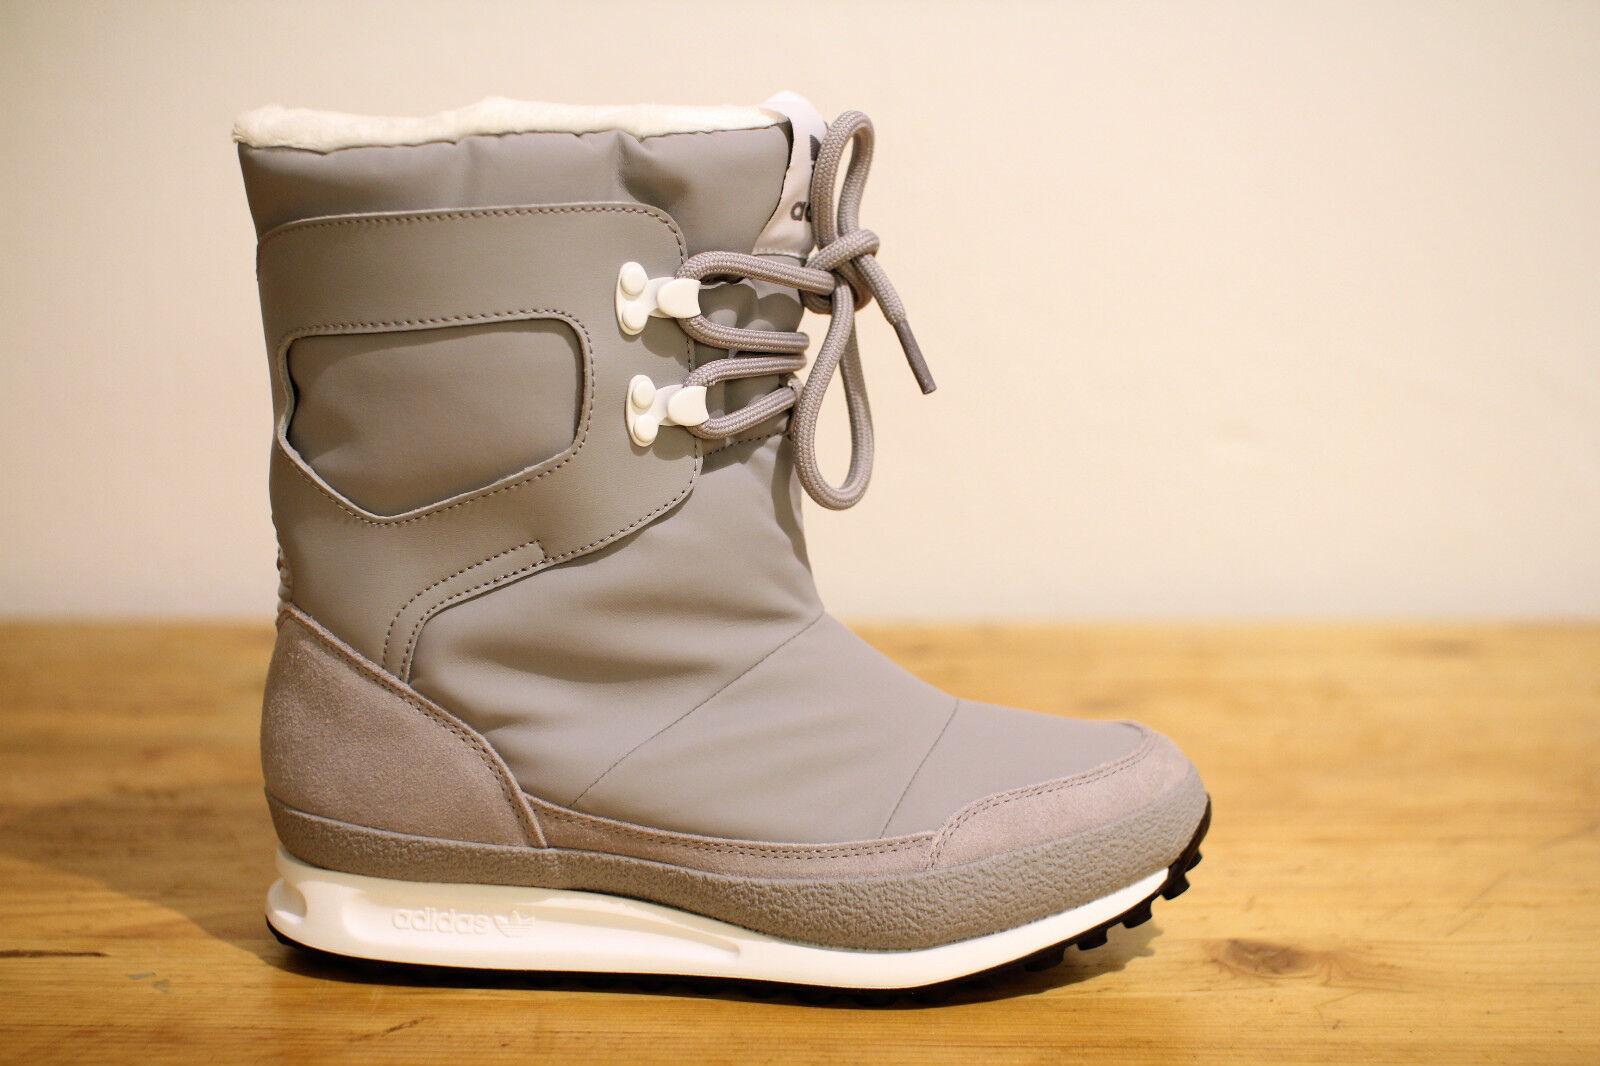 Adidas Originals Snowrush Winter Stiefel Grau Gr. 37,38,39,40 NEU & OVP